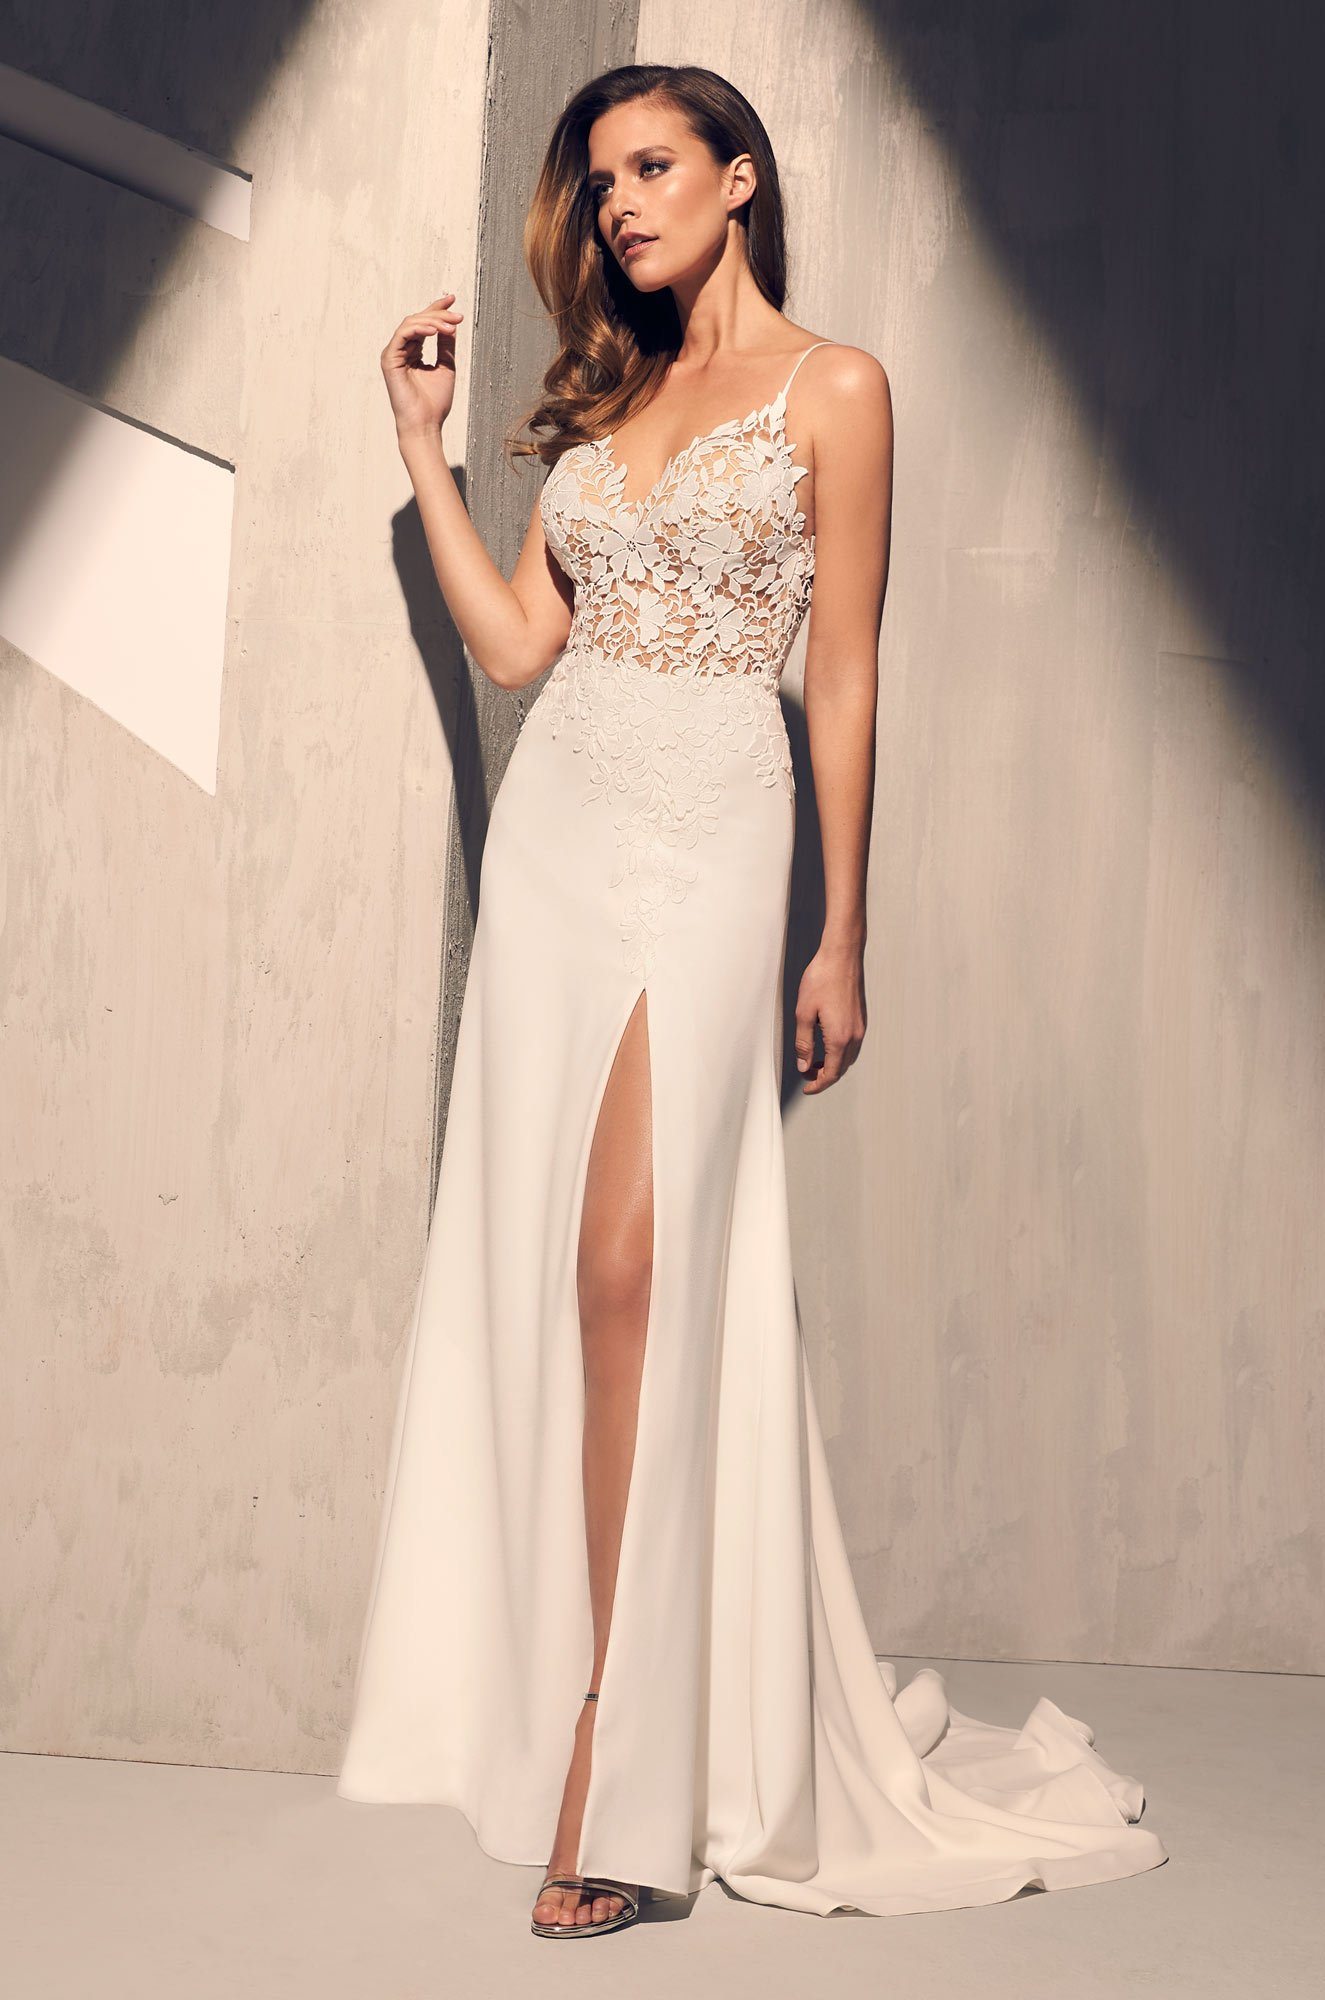 Sheer Floral Bodice Wedding Dress  Style 2208  Mikaella Bridal